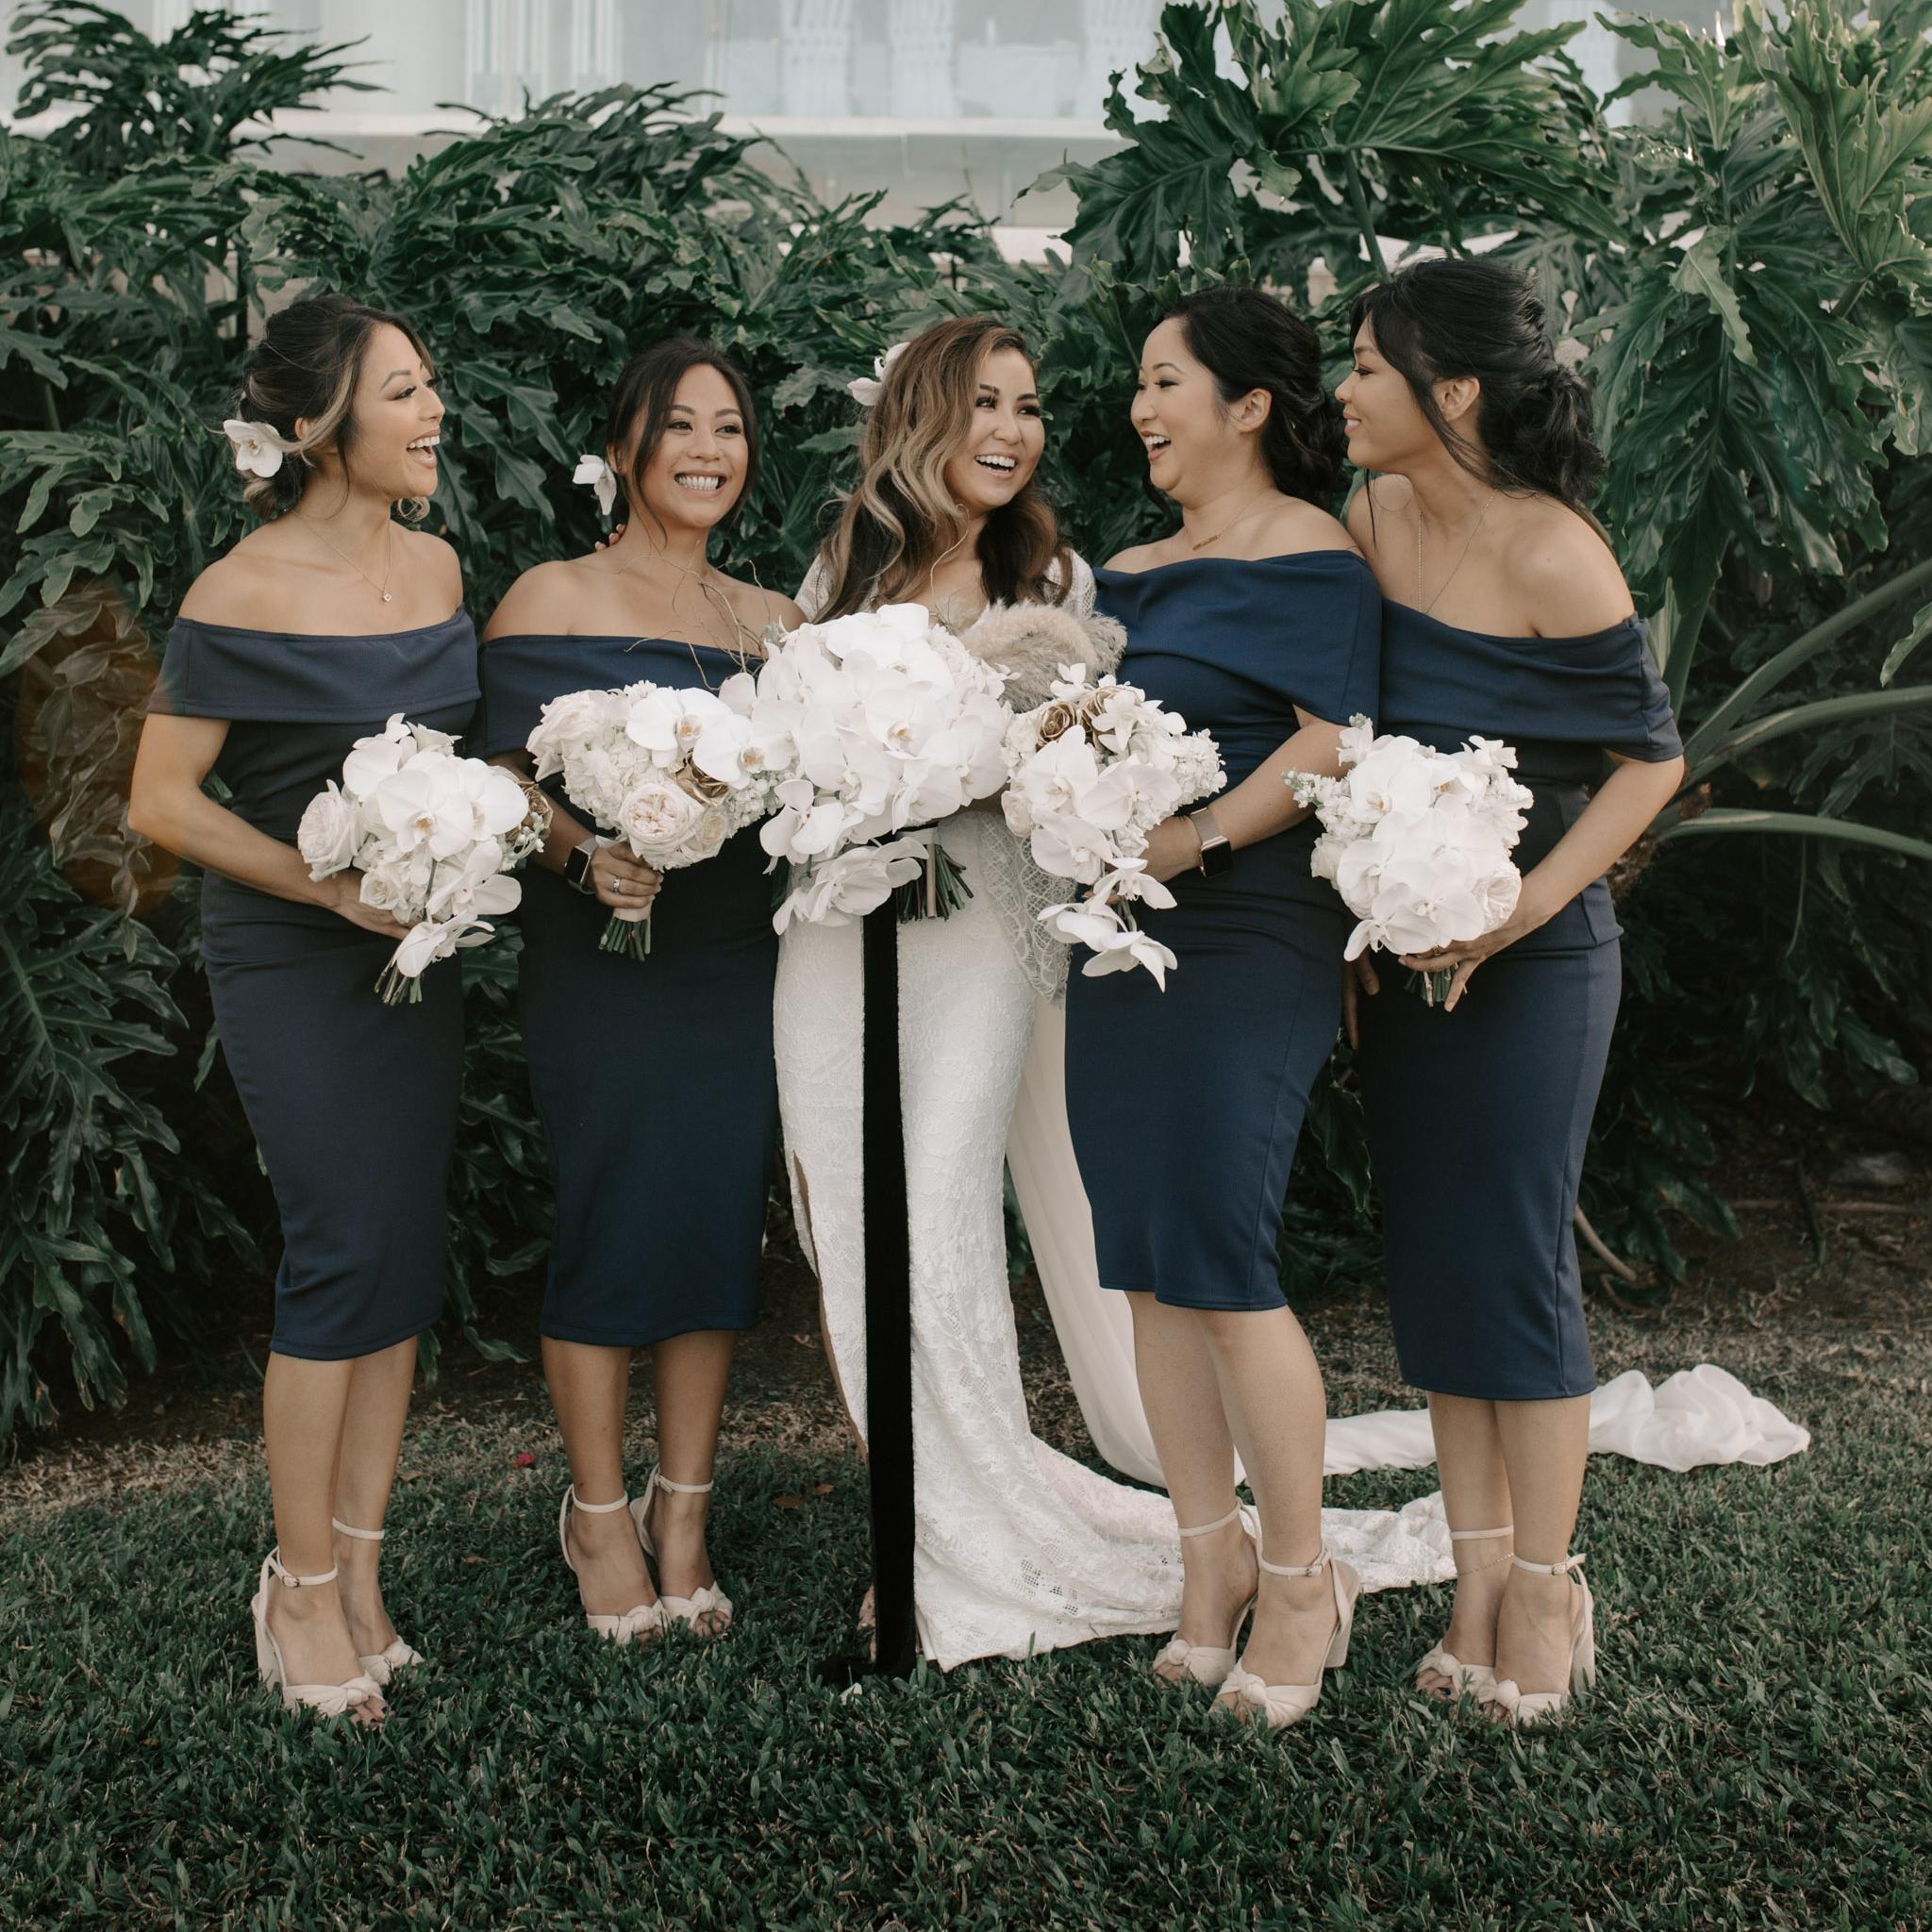 Bridesmaids laughing photo   Merriman's Kapalua Maui wedding by Hawaii wedding photographer Desiree Leilani